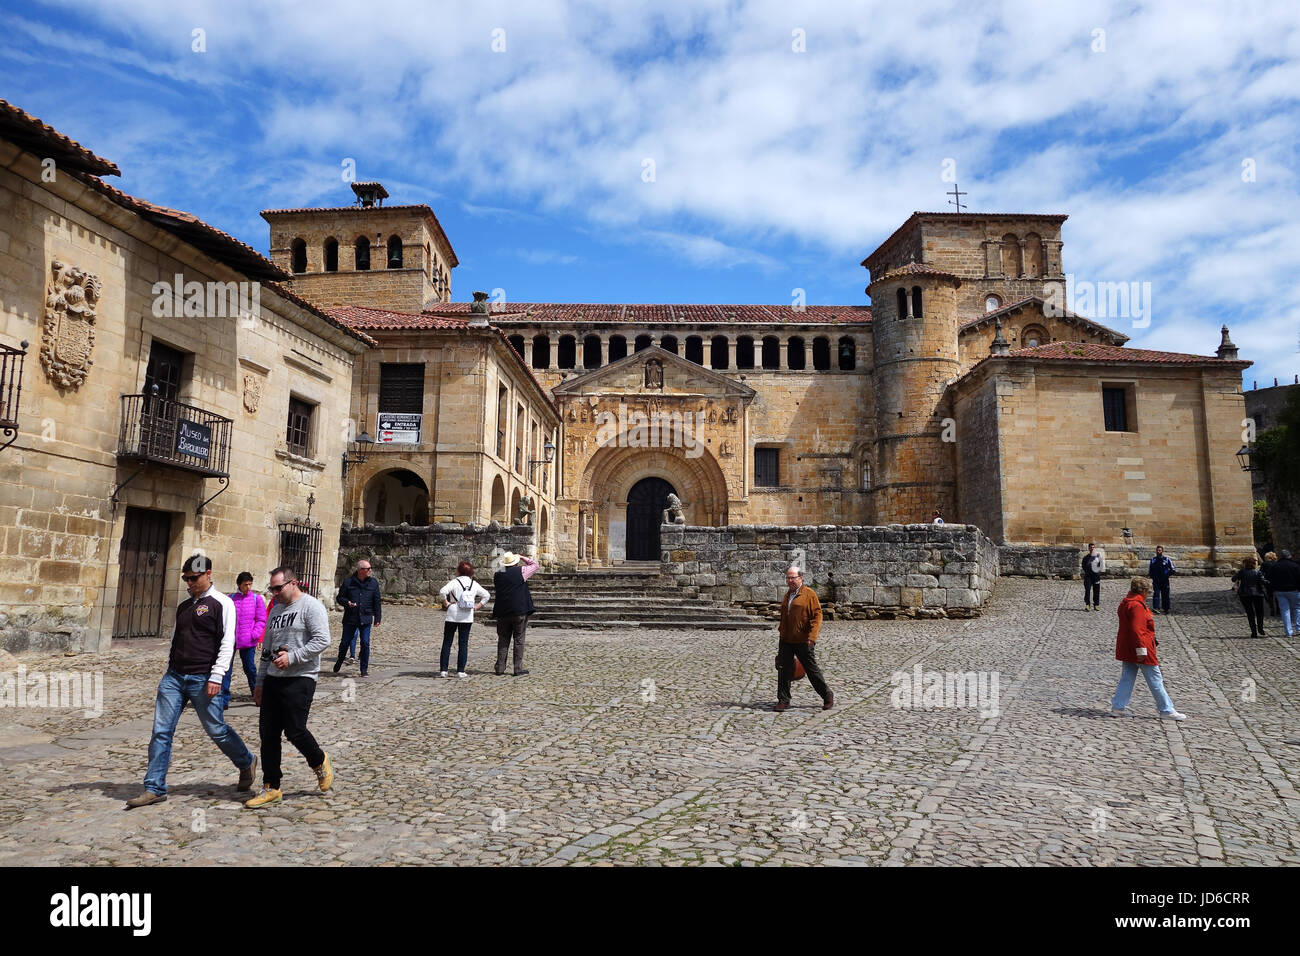 Church of the Colegiata at Santillana del Mar historic town situated in Cantabria Spain - Stock Image